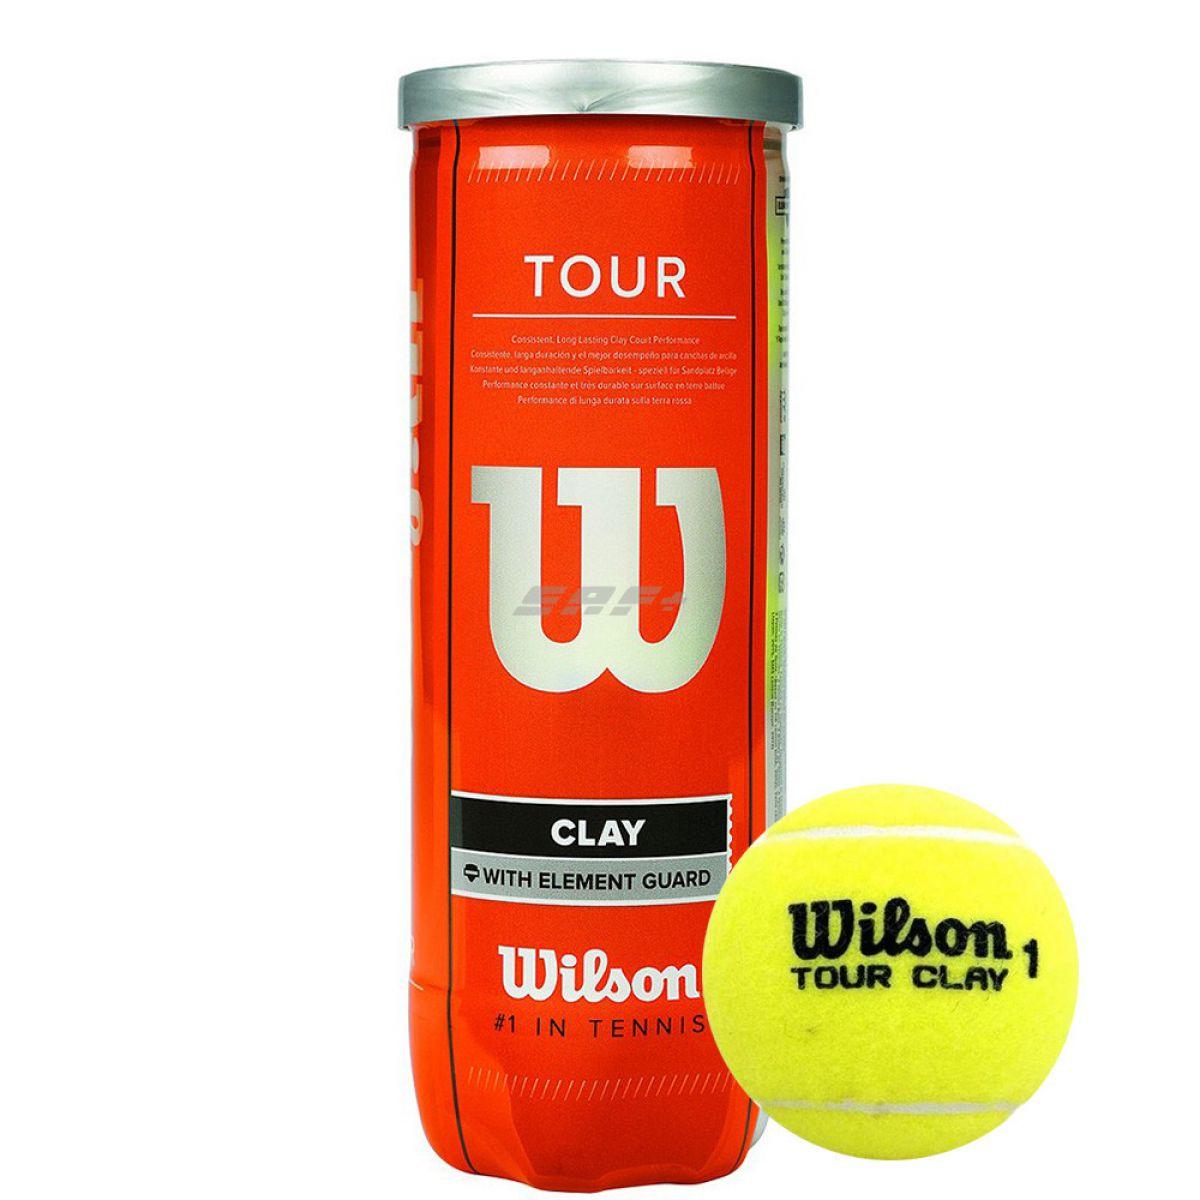 Мяч теннисный WILSON Tour Clay, арт. WRT108900,одобр.ITF и USTA,фетр,нат.резина, уп.3 шт, желтый